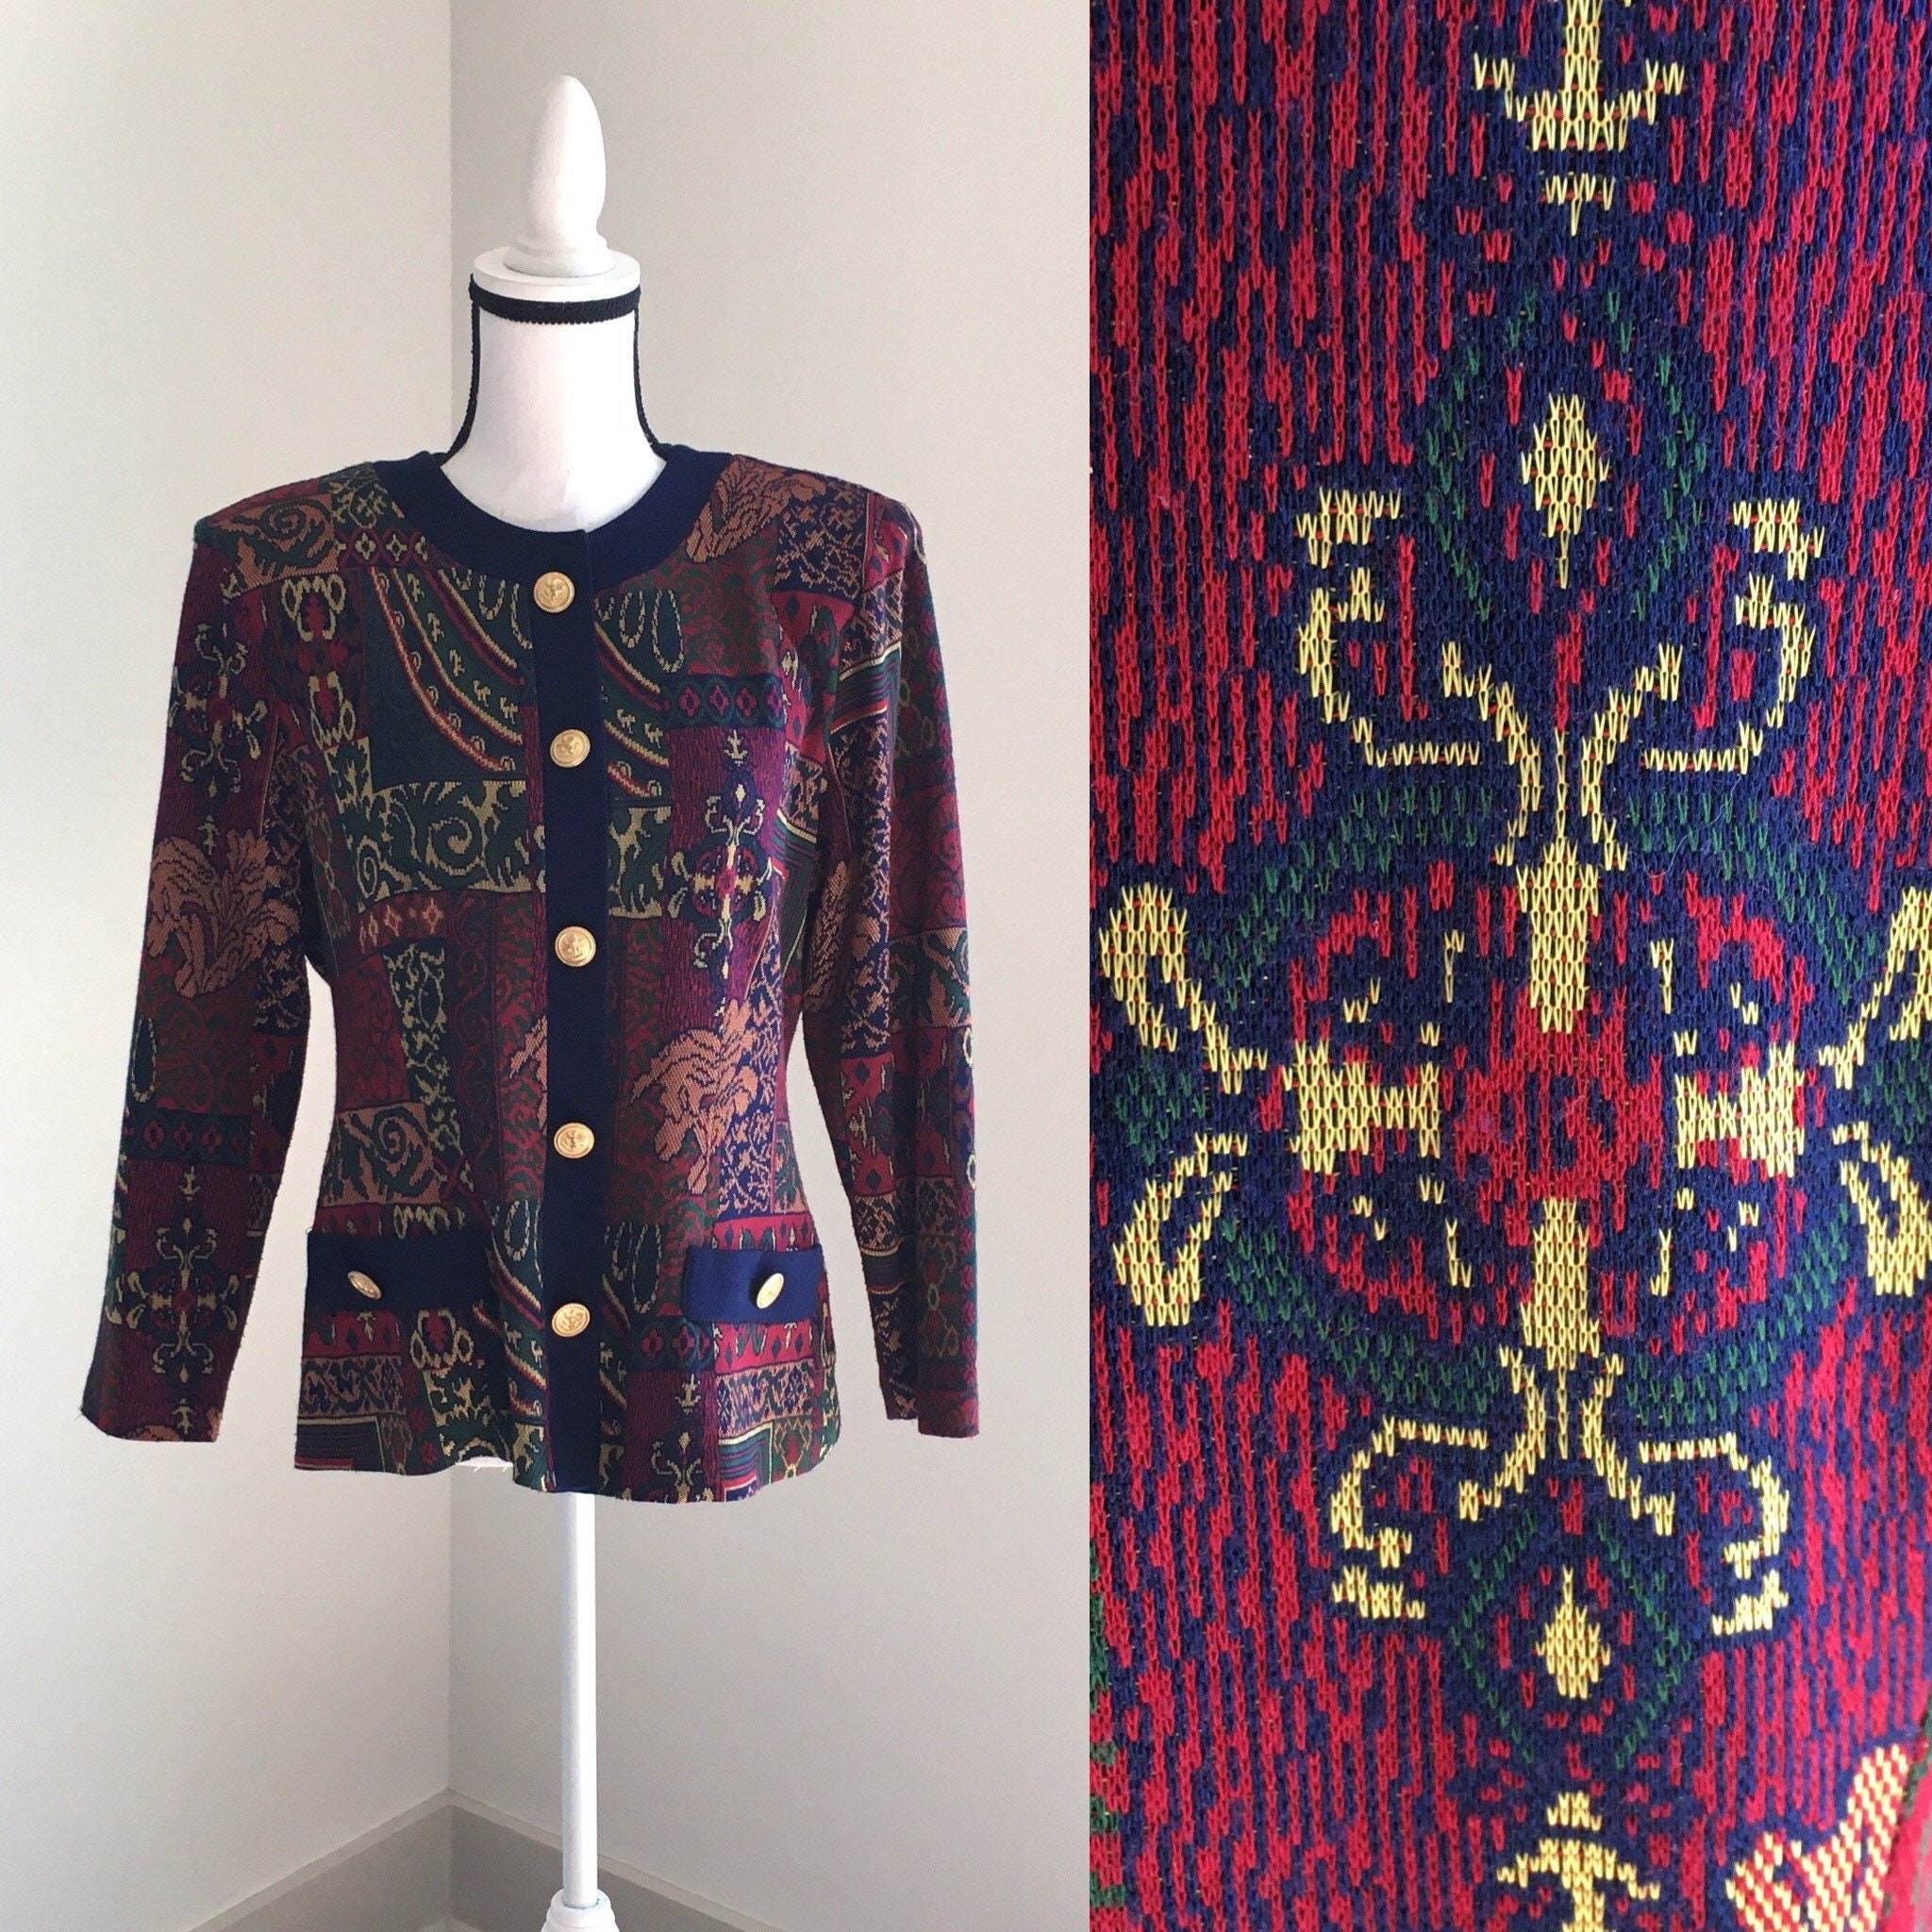 80s Sweatshirts, Sweaters, Vests | Women 1980S Sweater Blazer, 1980S Cardigan Jacket, Vintage Baroque Sweater, Vintage Blazer, Gold Lion Crest Buttons $30.00 AT vintagedancer.com